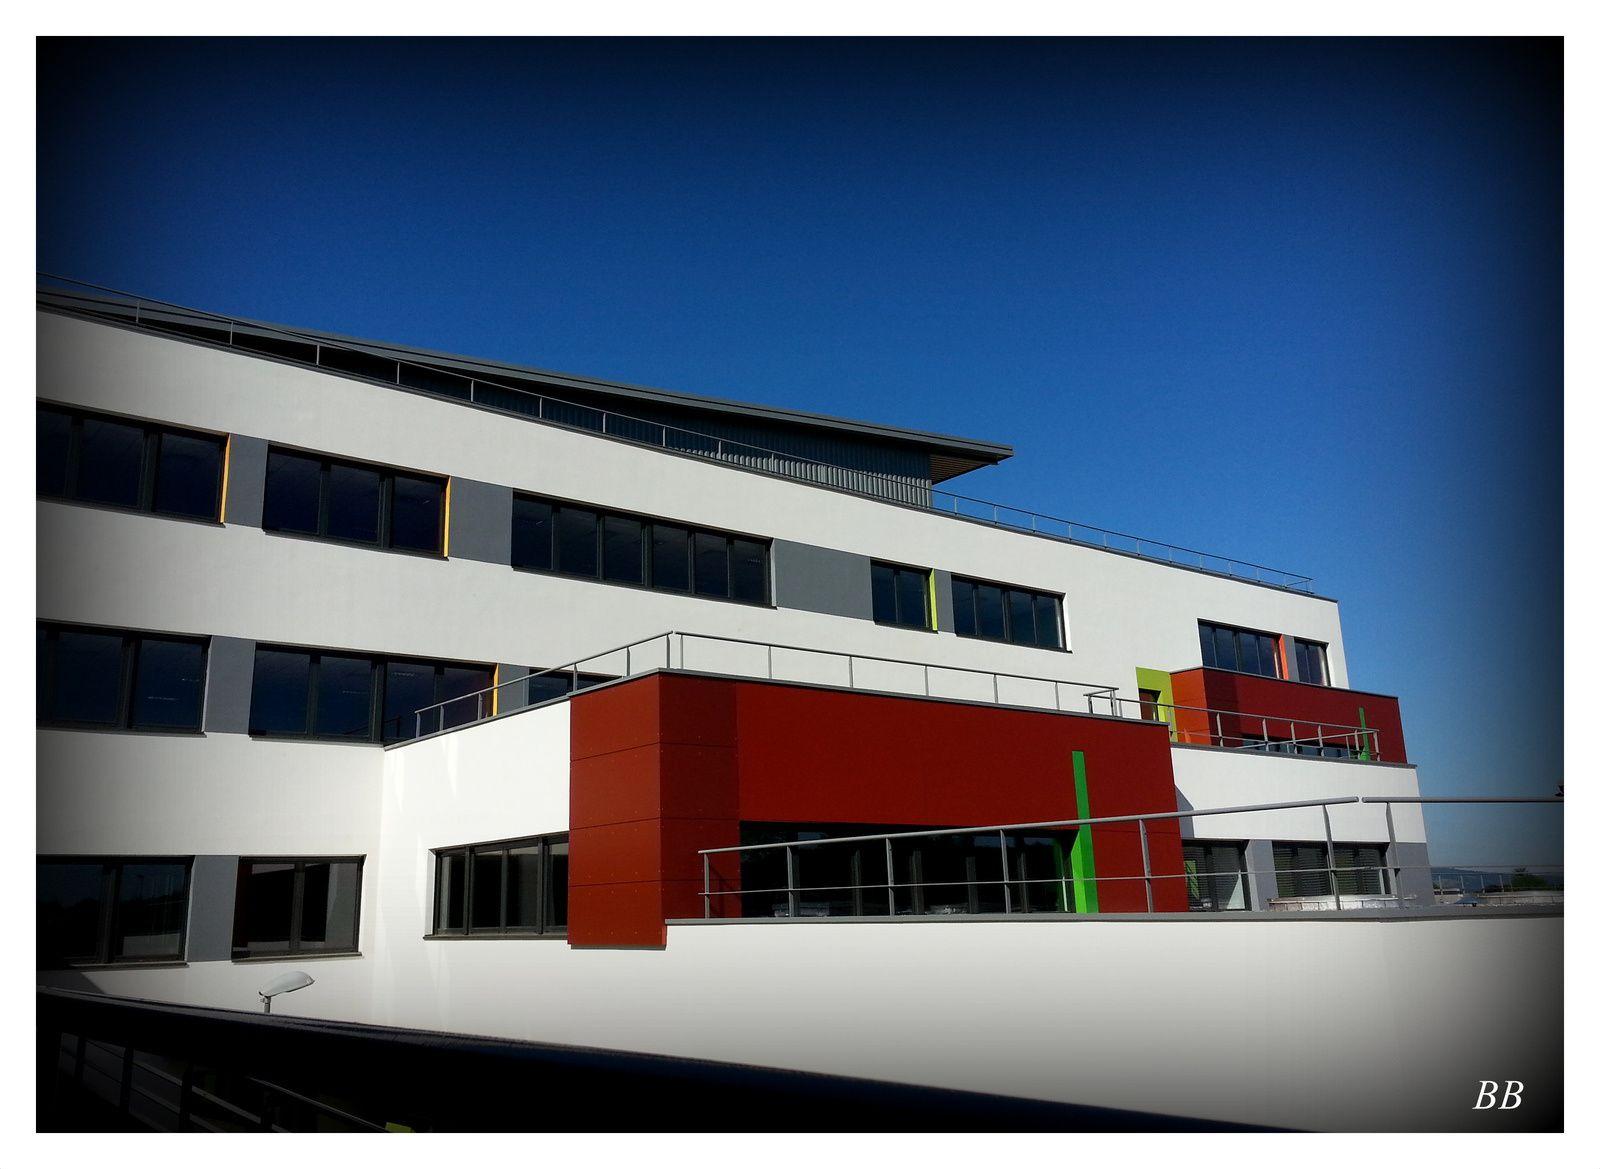 Collège Nelson Mandela de VERNY inauguration le 2 septembre 2014